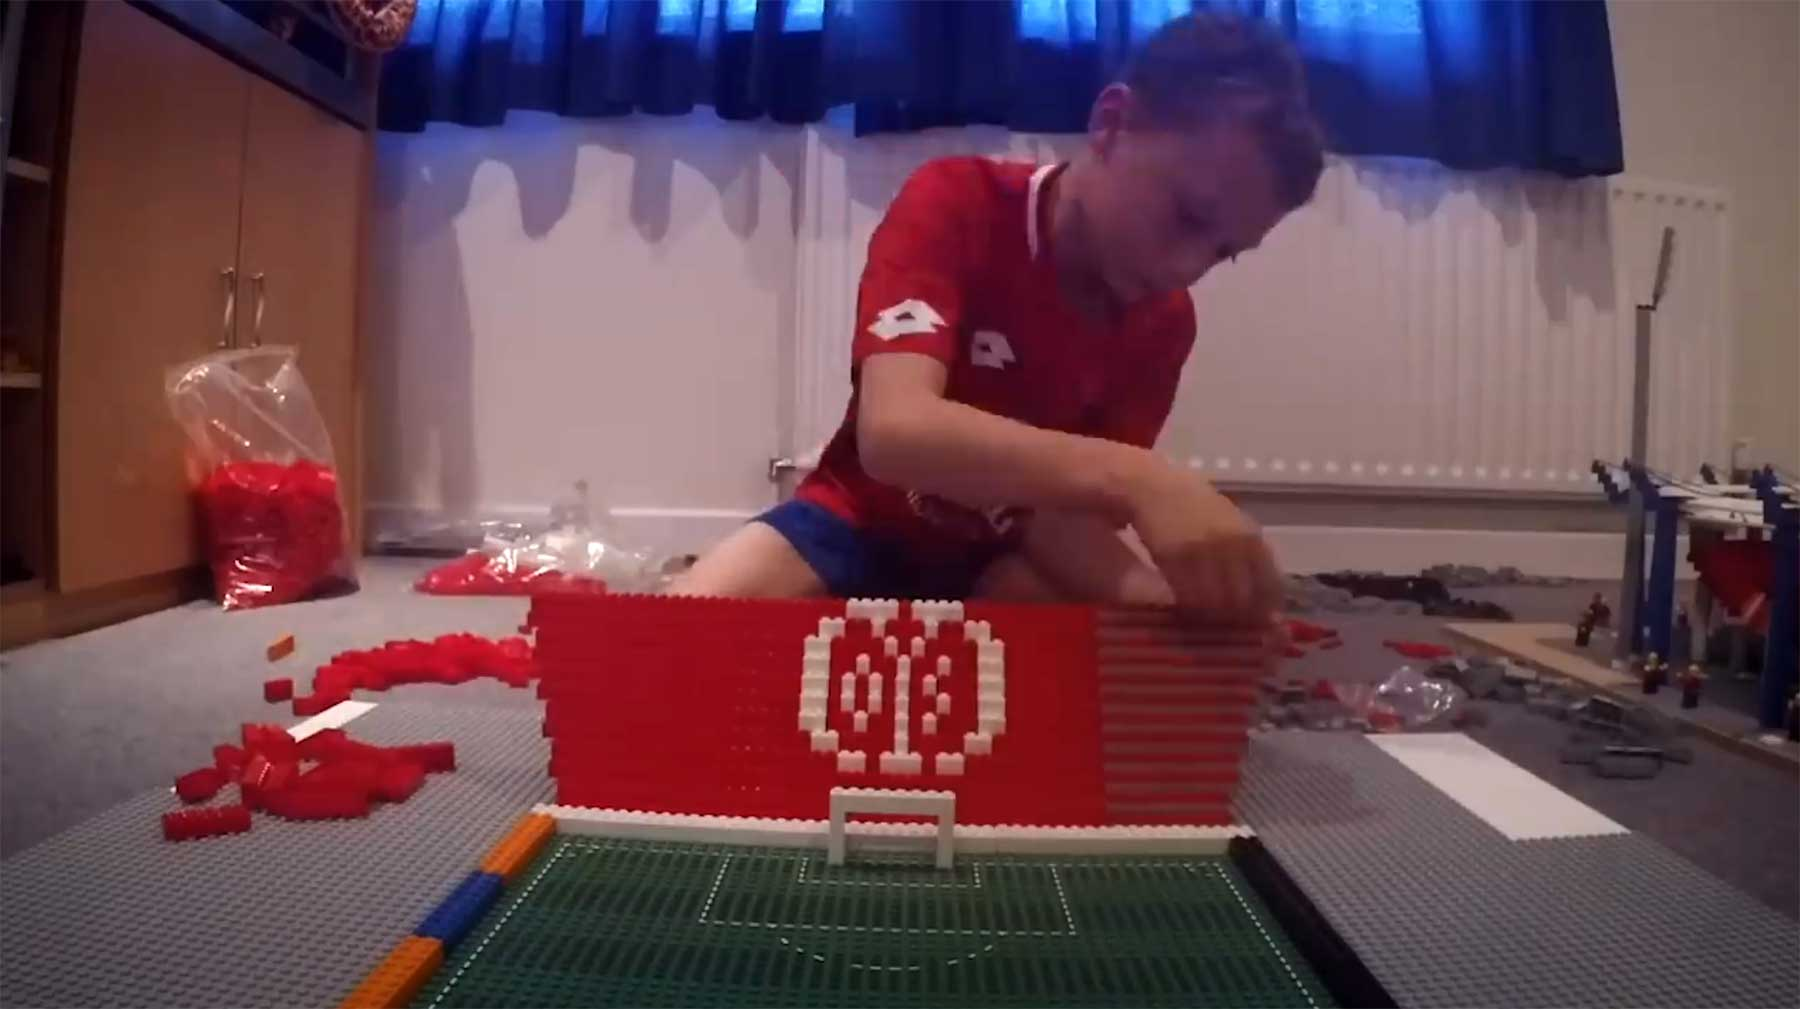 Timelapse: 10-jähriger Brite baut Mainz-Stadion aus LEGO kleiner-fan-baut-grosses-legostadtion-mainz